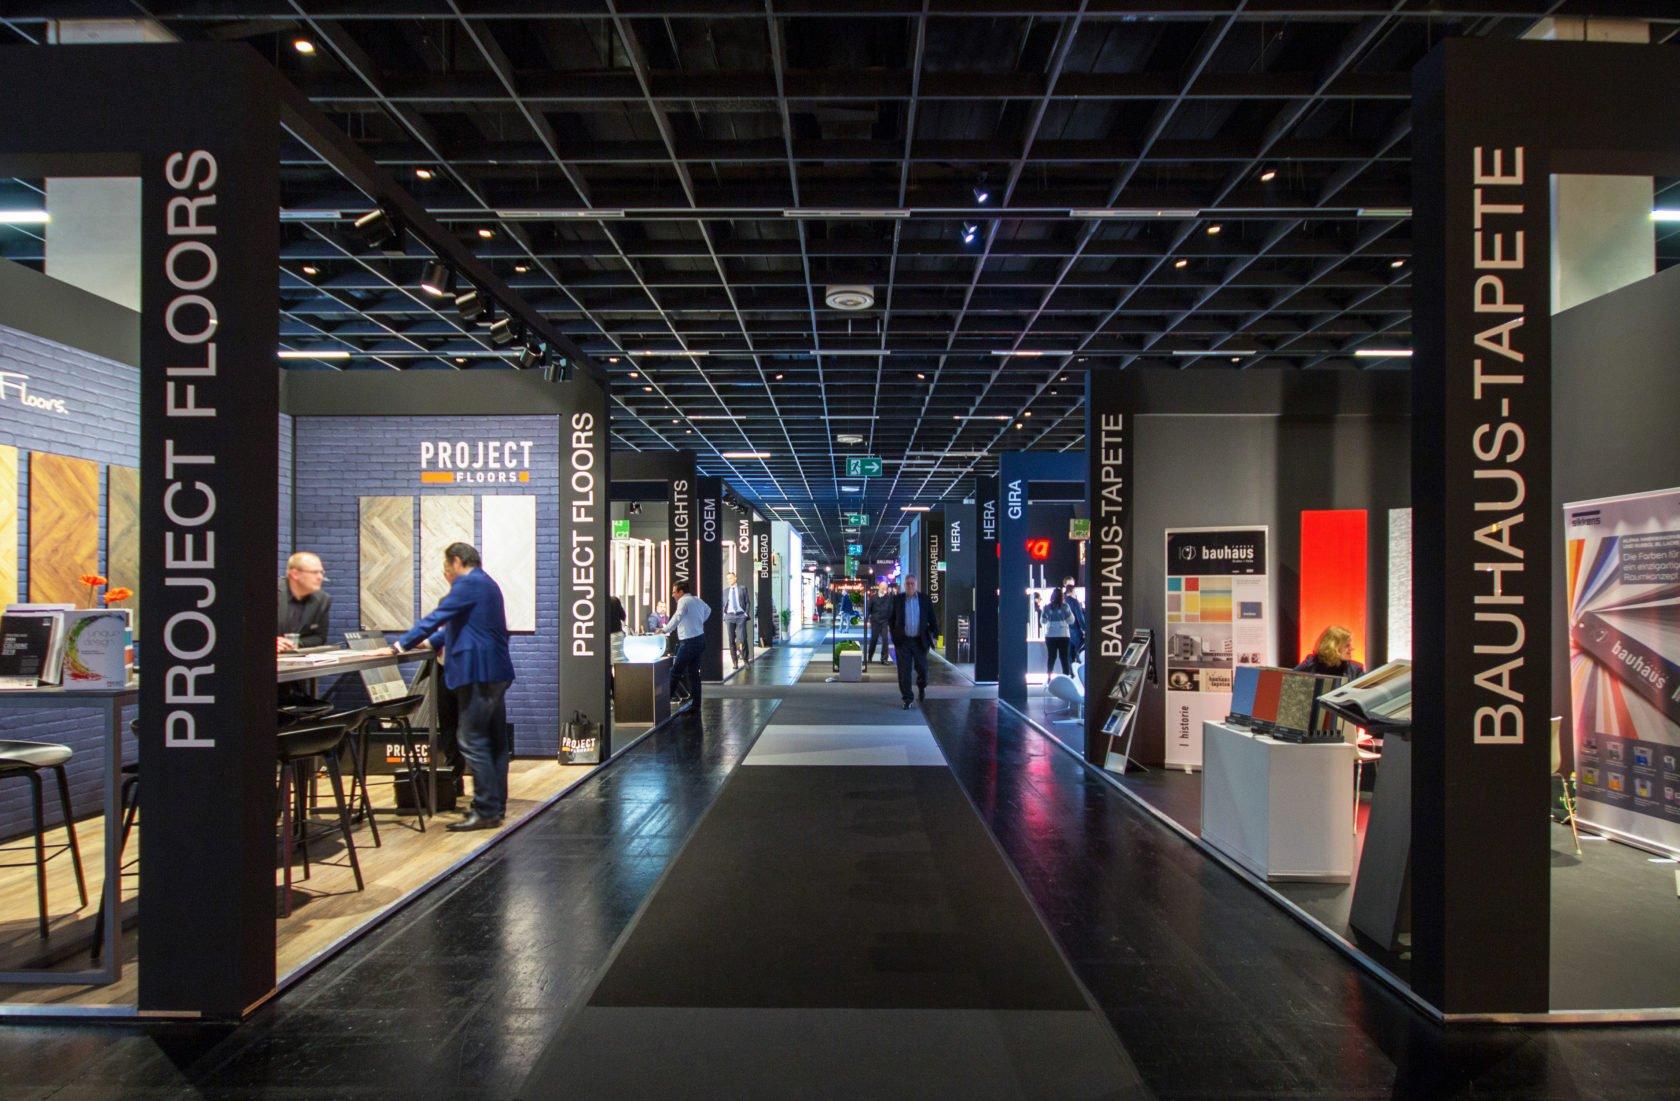 Imm 2018 Pure Architects 1